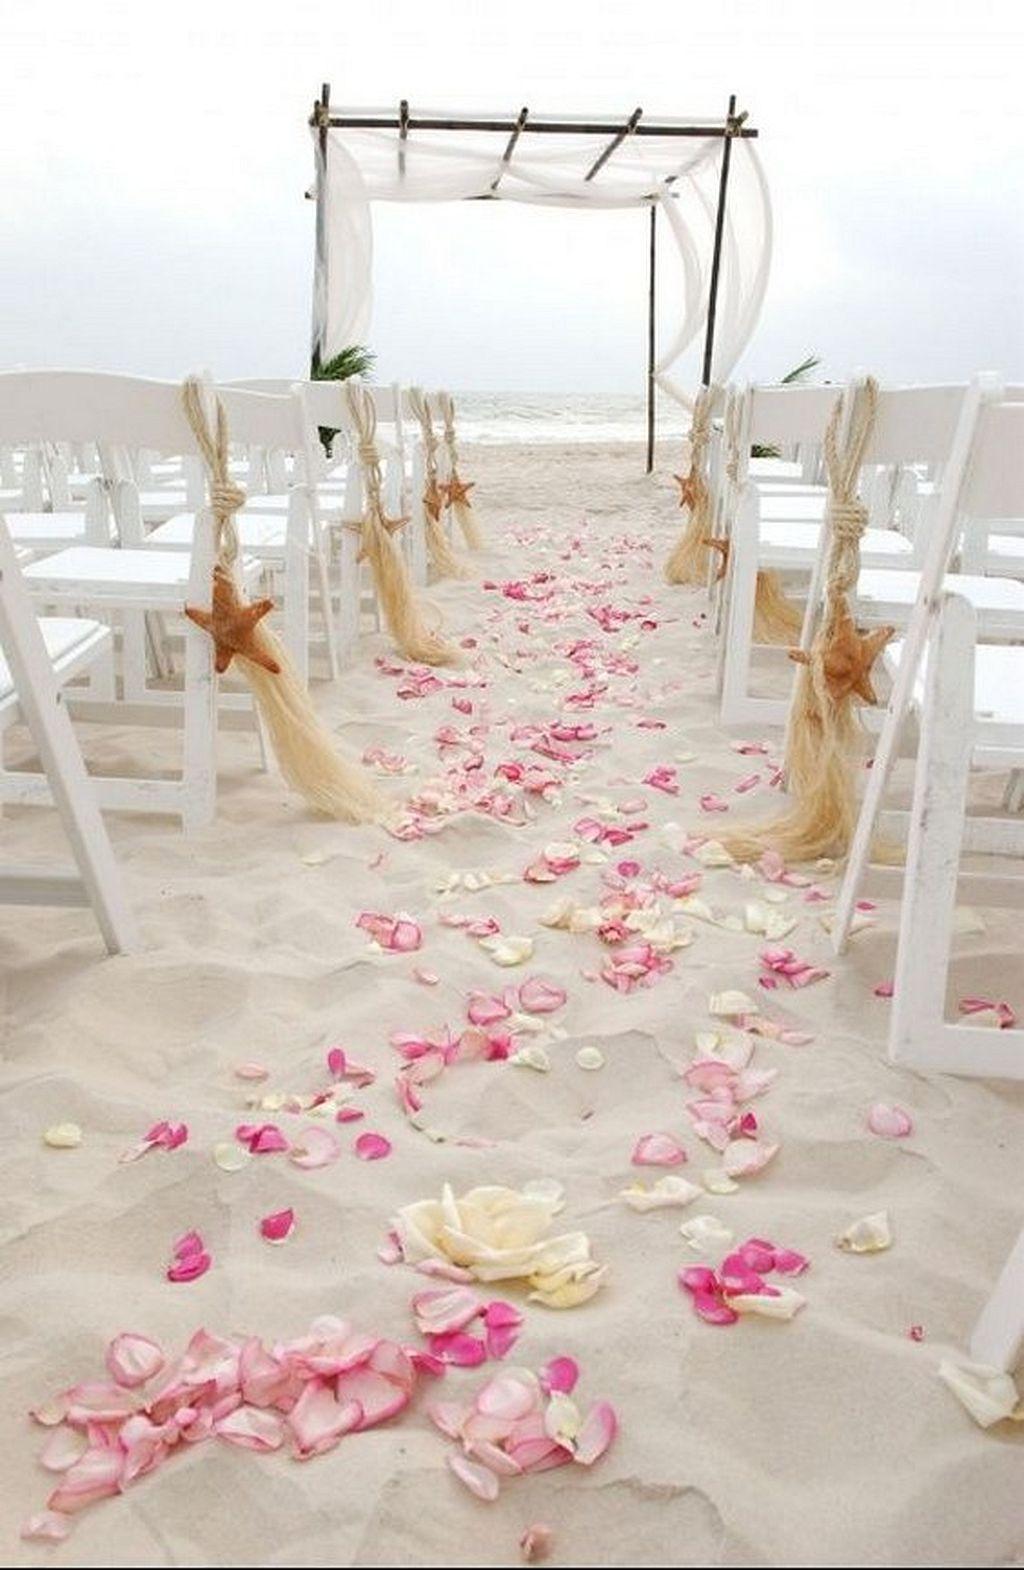 20 Wonderful Looks for a Beach Wedding (as a Guest)